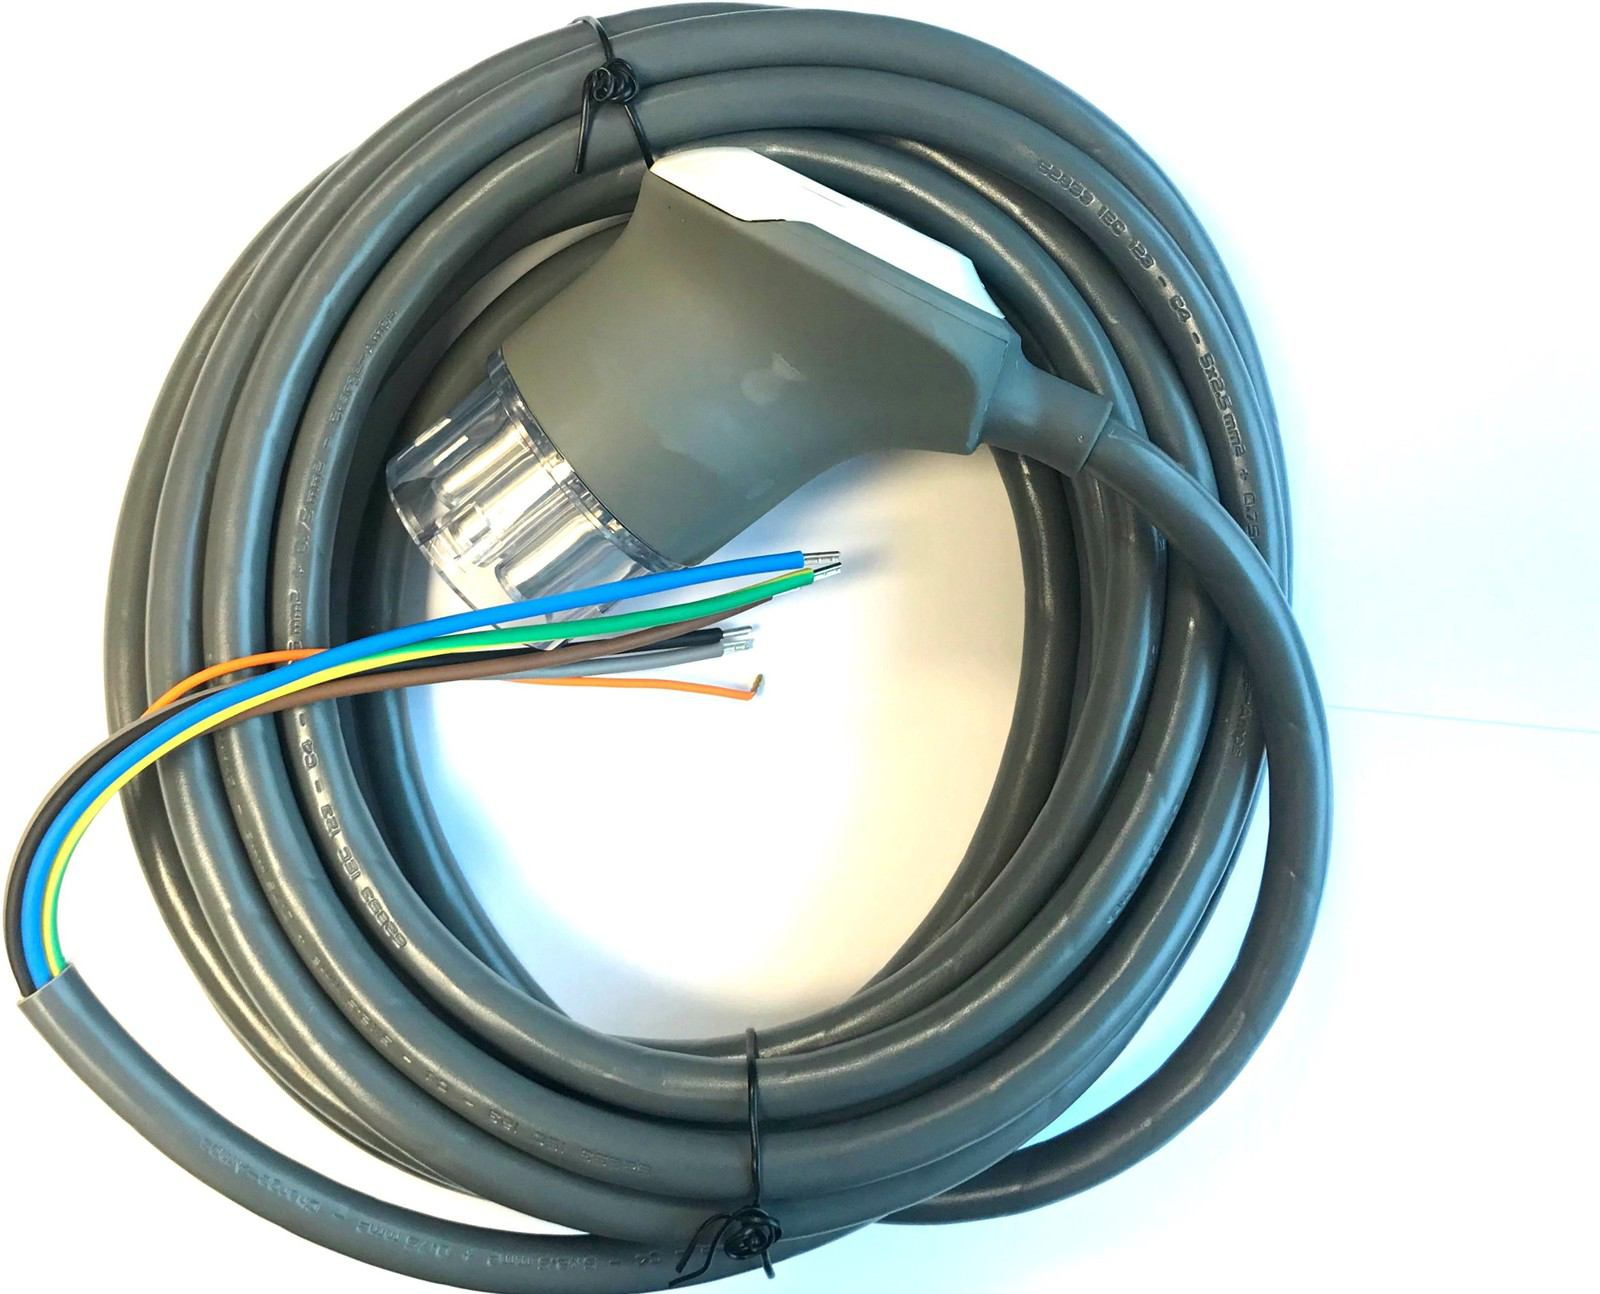 2044315-HALO-Cable-Type-2-16A-1P-7-5m-Sparepart-Warranty-3Y